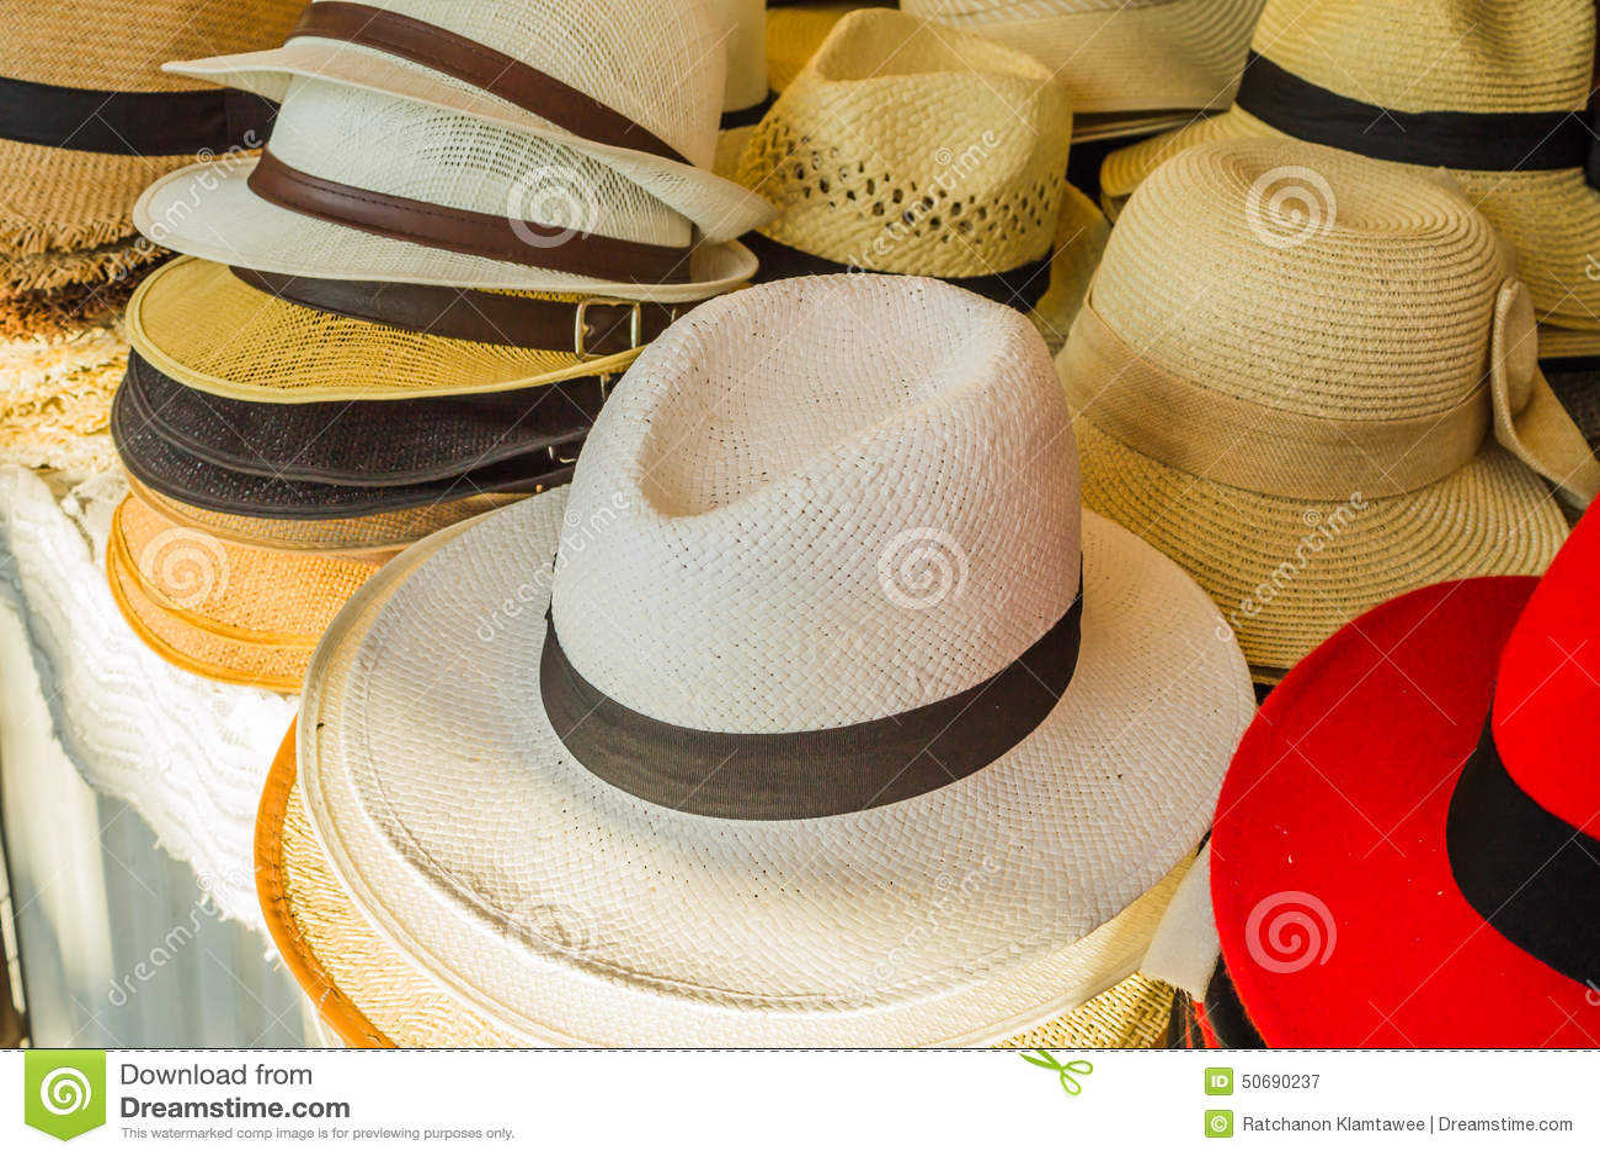 Download 五颜六色的帽子 库存图片. 图片 包括有 方式, 秸杆, 题头, beatles, 颜色, 彩虹, 至福 - 50690237